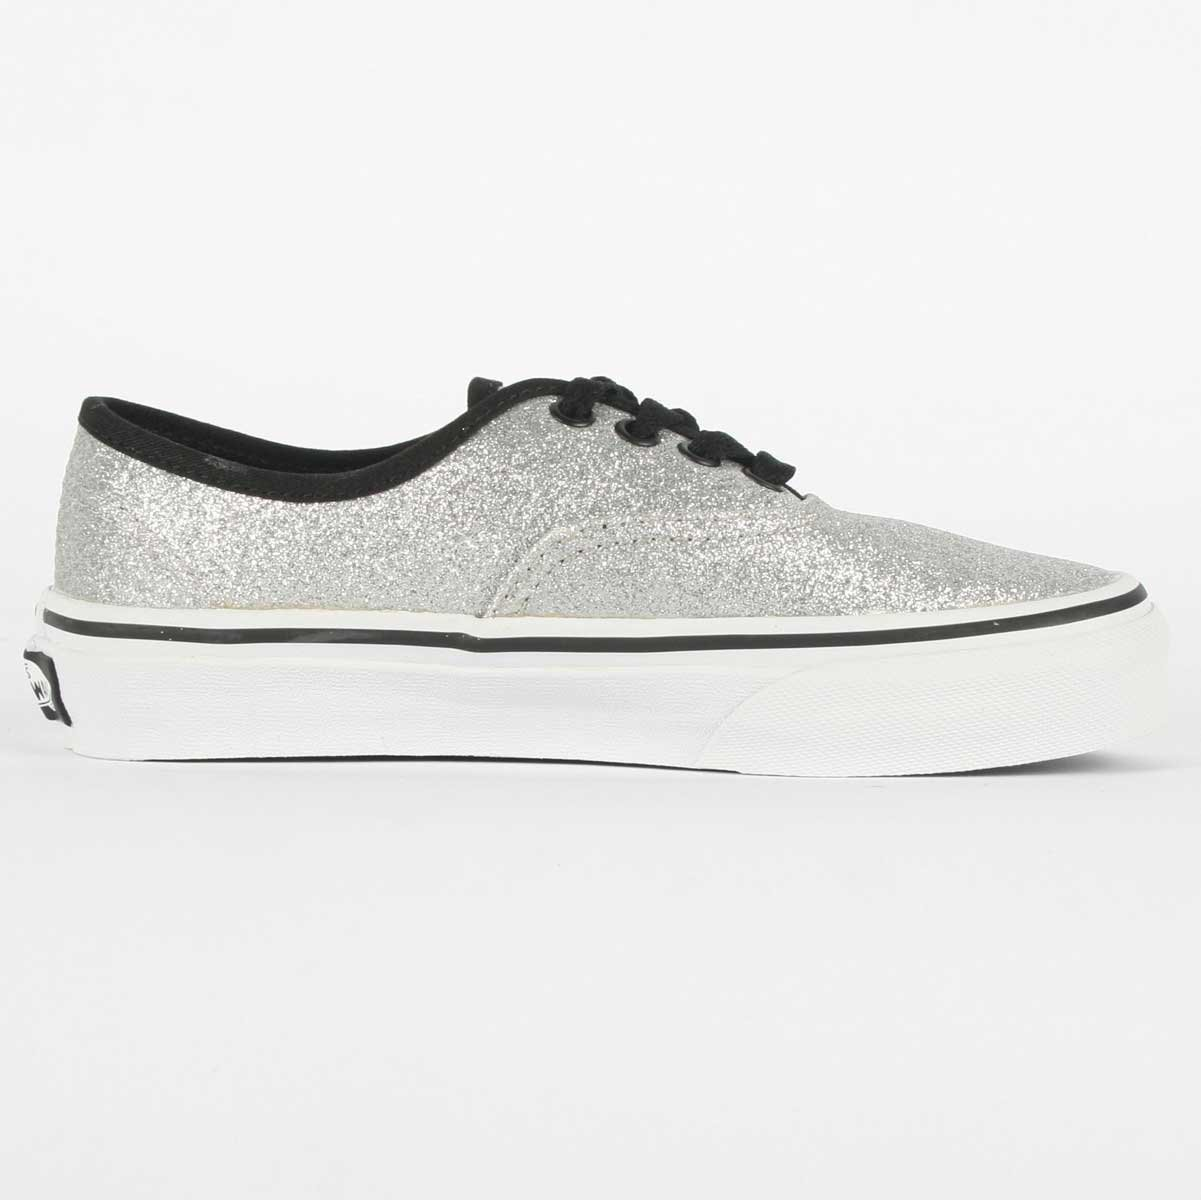 Vans Girls Authentic Fashion-Sneakers  861eb13ec5